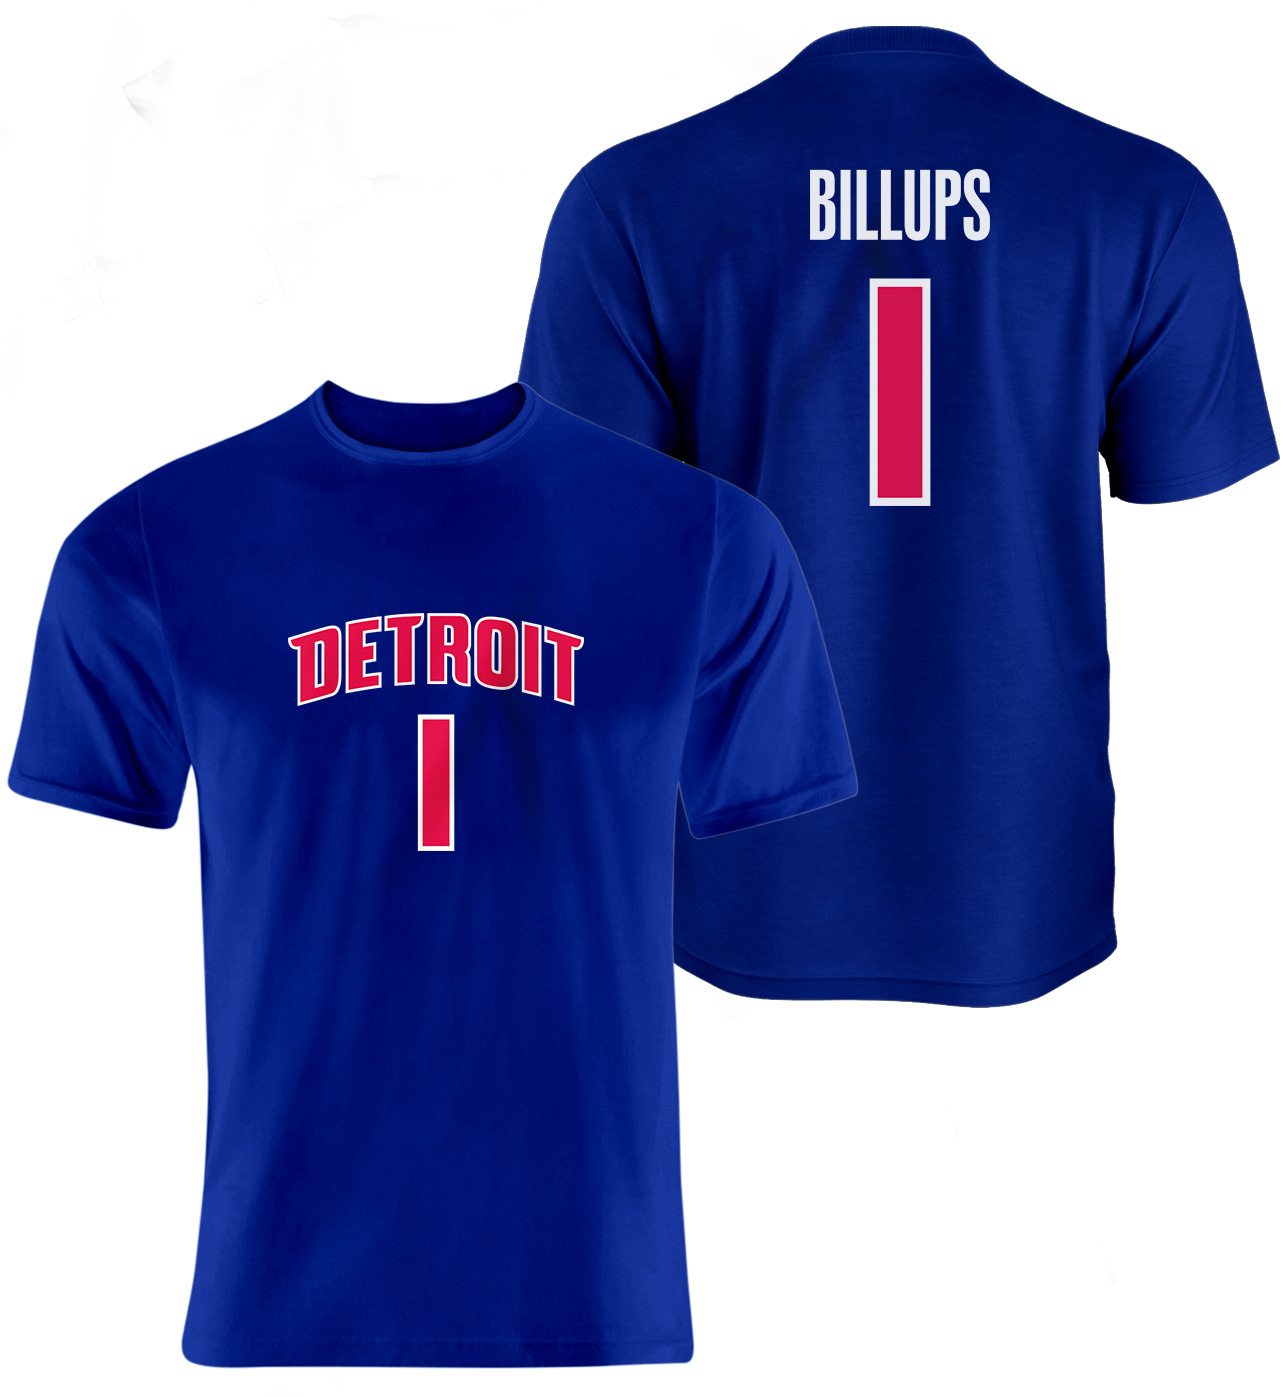 Detroit Pistons Chauncey Billups Vertical Tshirt (TSH-BLU-NP-75-PLYR-DET-BILLUPS.FRM)